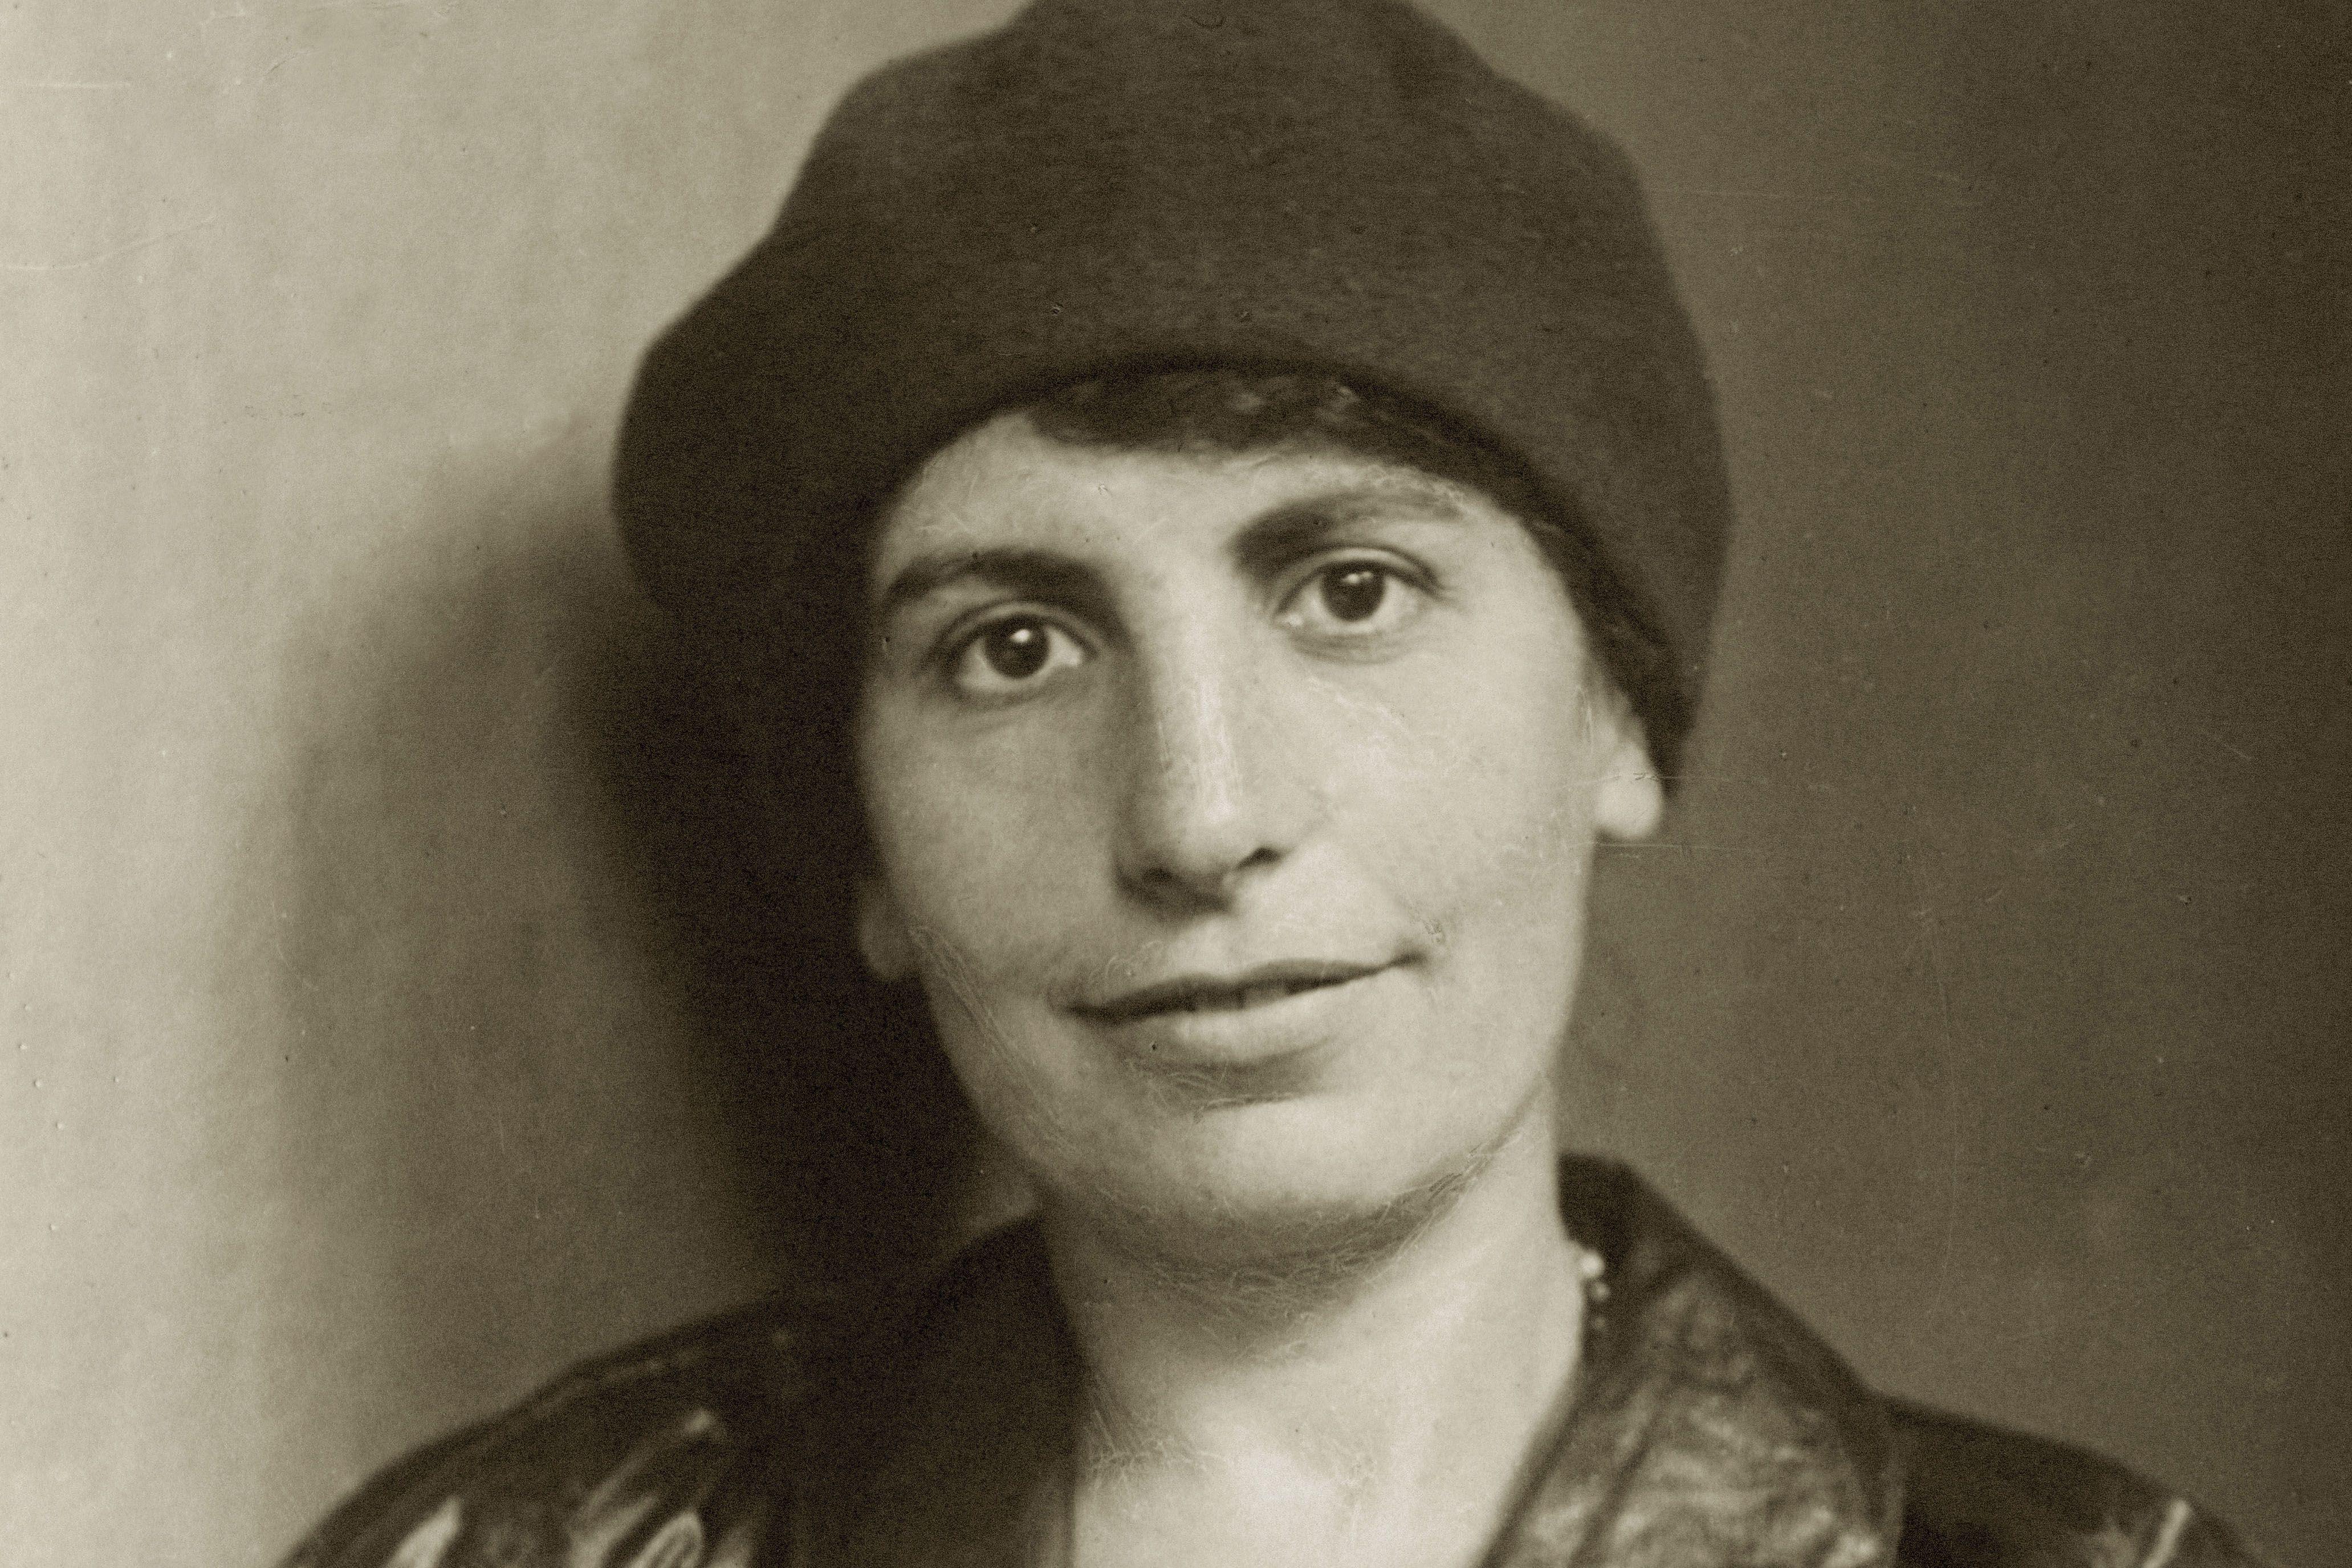 Portrait of Anna Freud